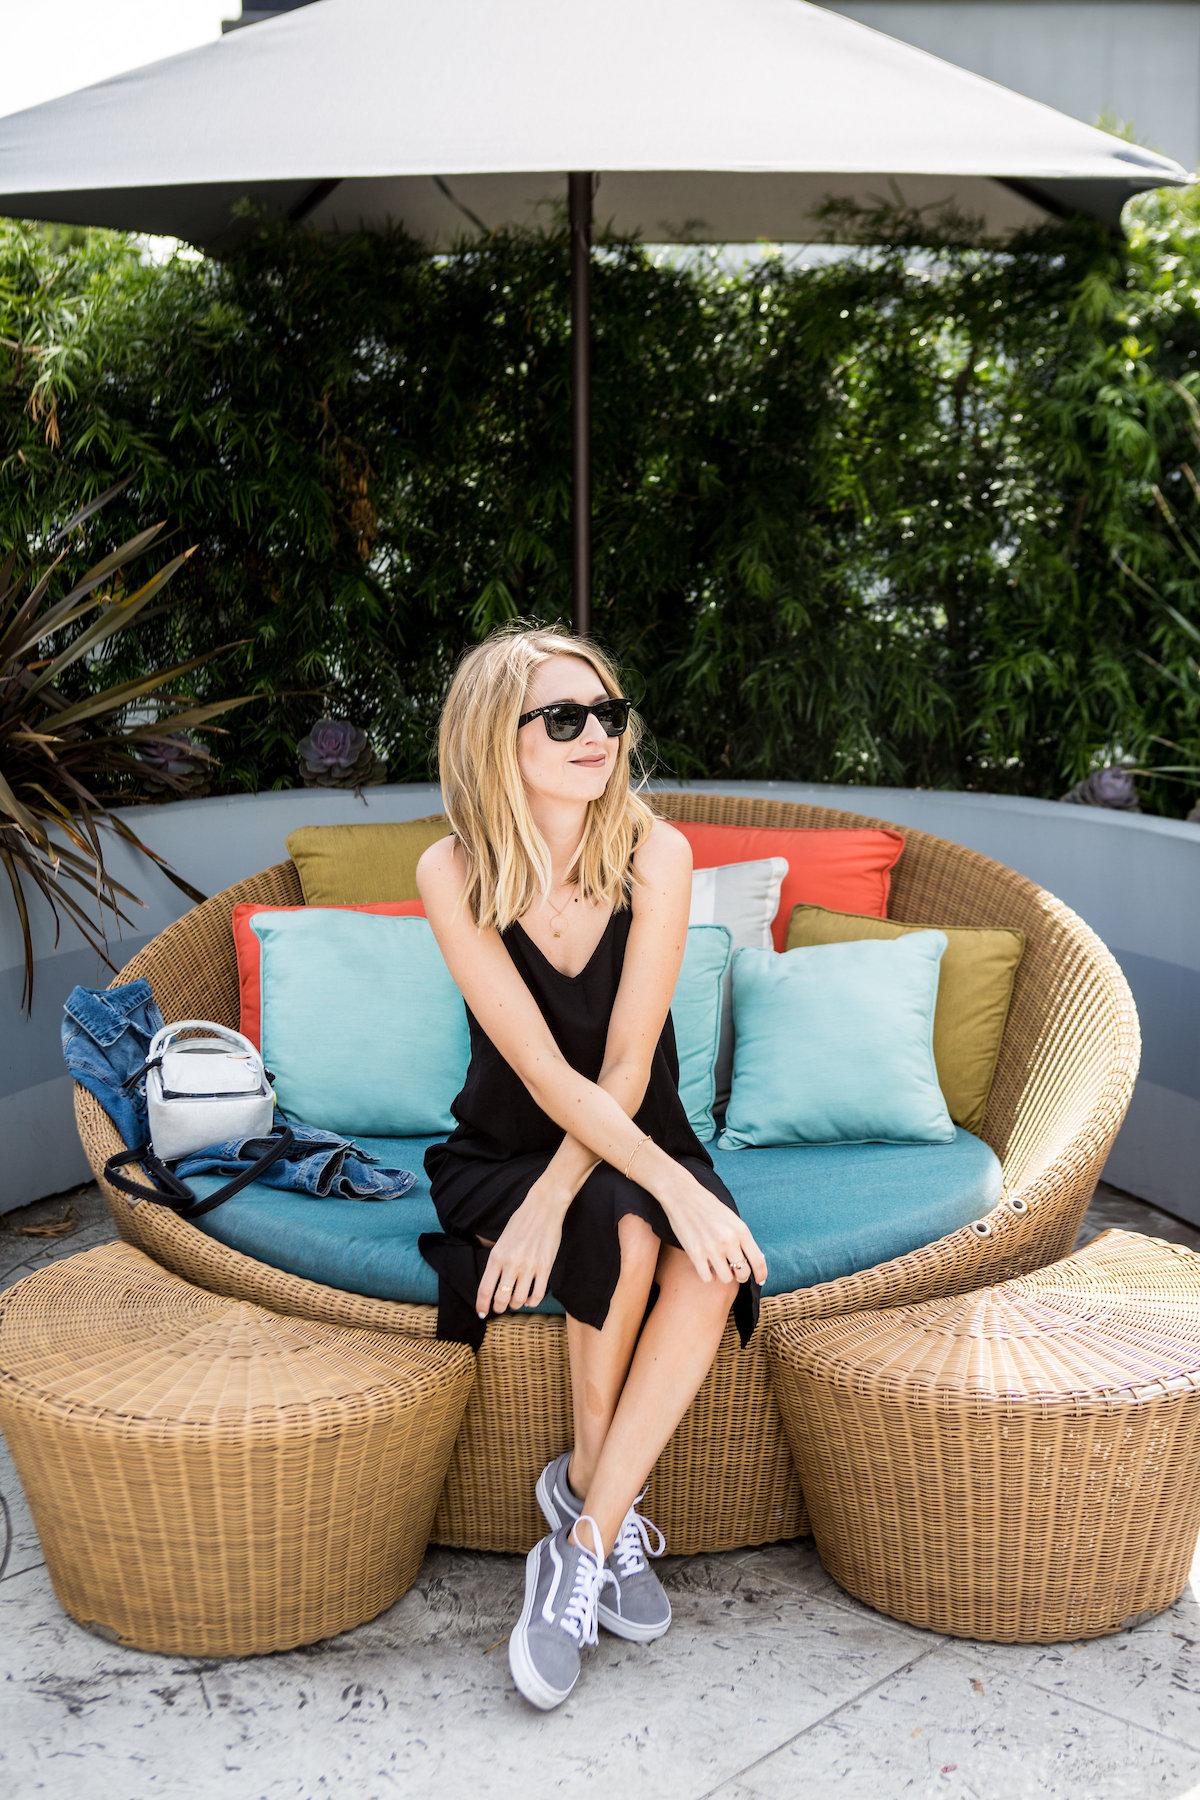 Home Sweet Hotel: Sofitel Los Angeles   truelane